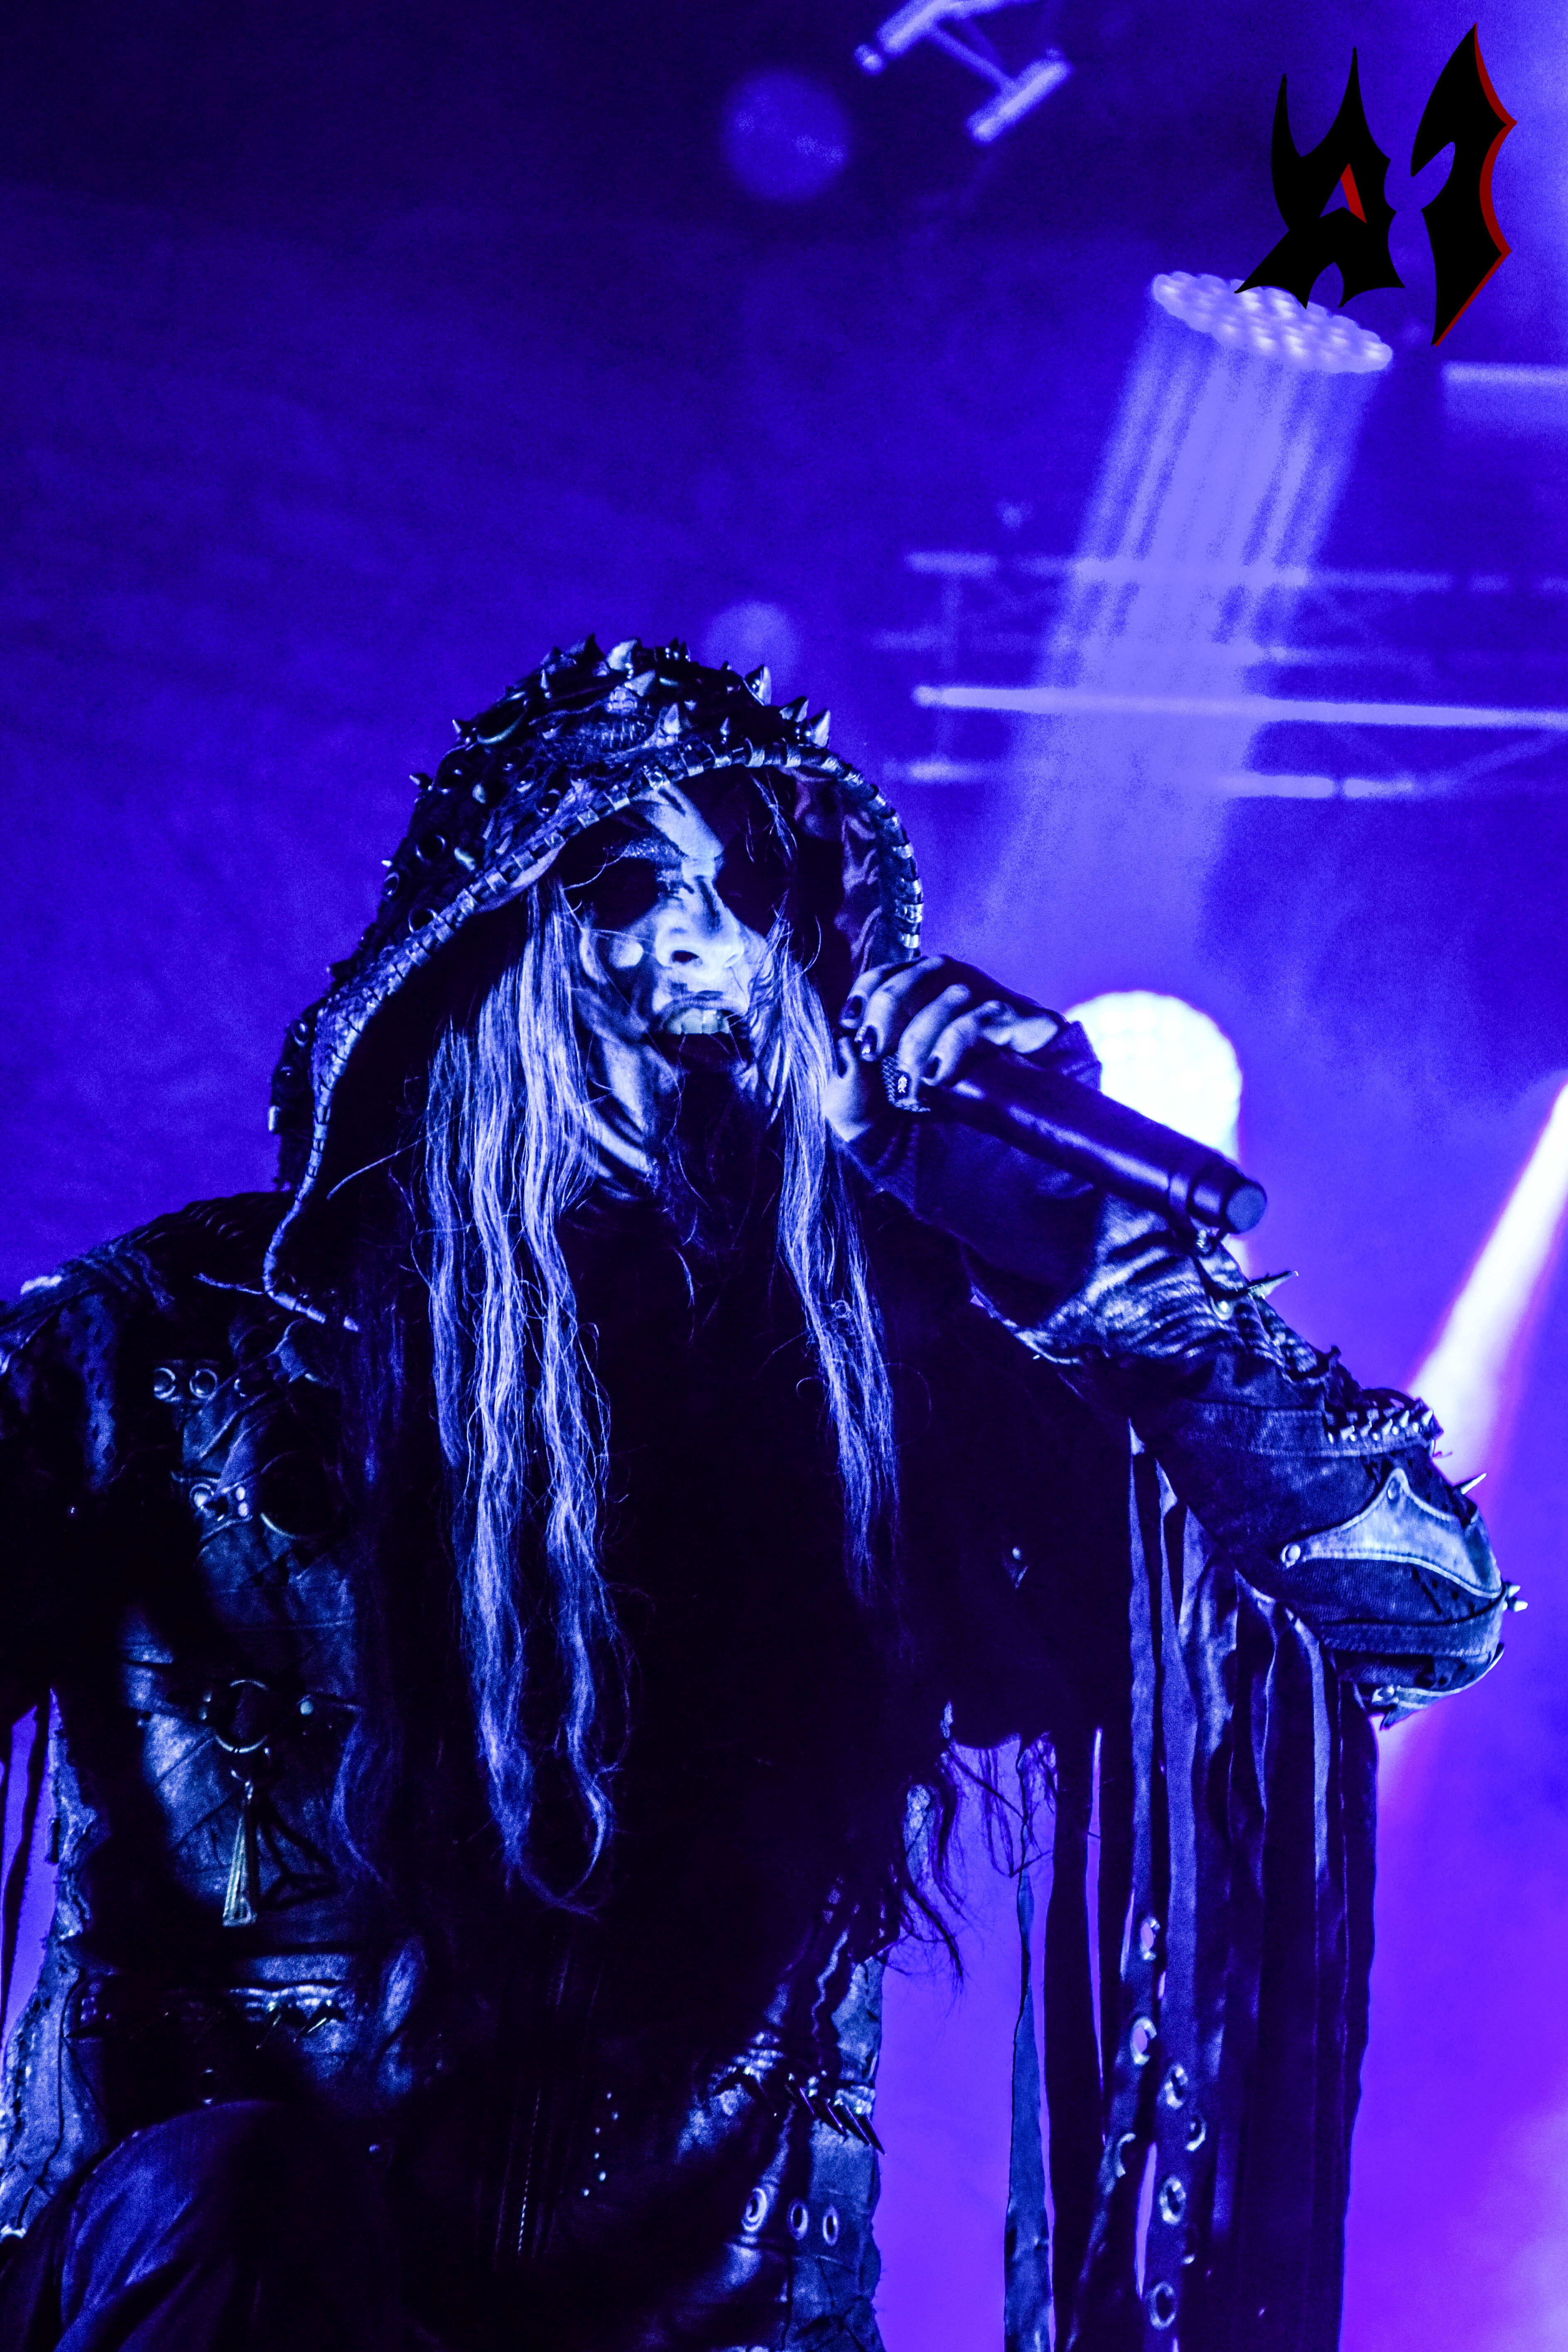 Hellfest - Jour 2 - Dimmu Borgir 10